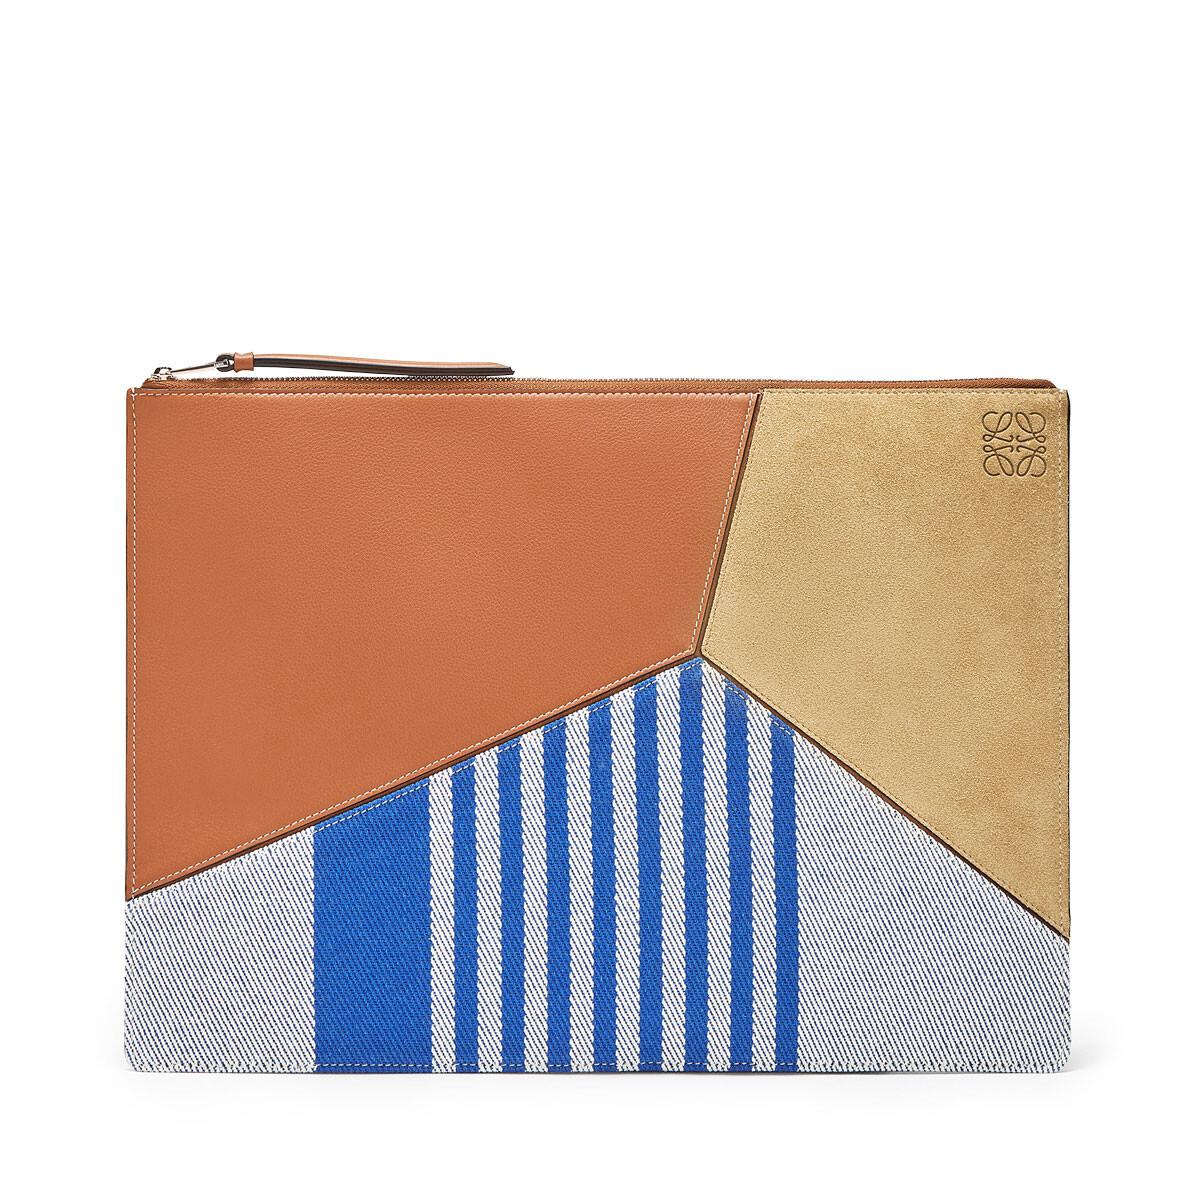 LOEWE Pouch Plano Grande Raya Puzzle Azul Pacifico/Multicolor front